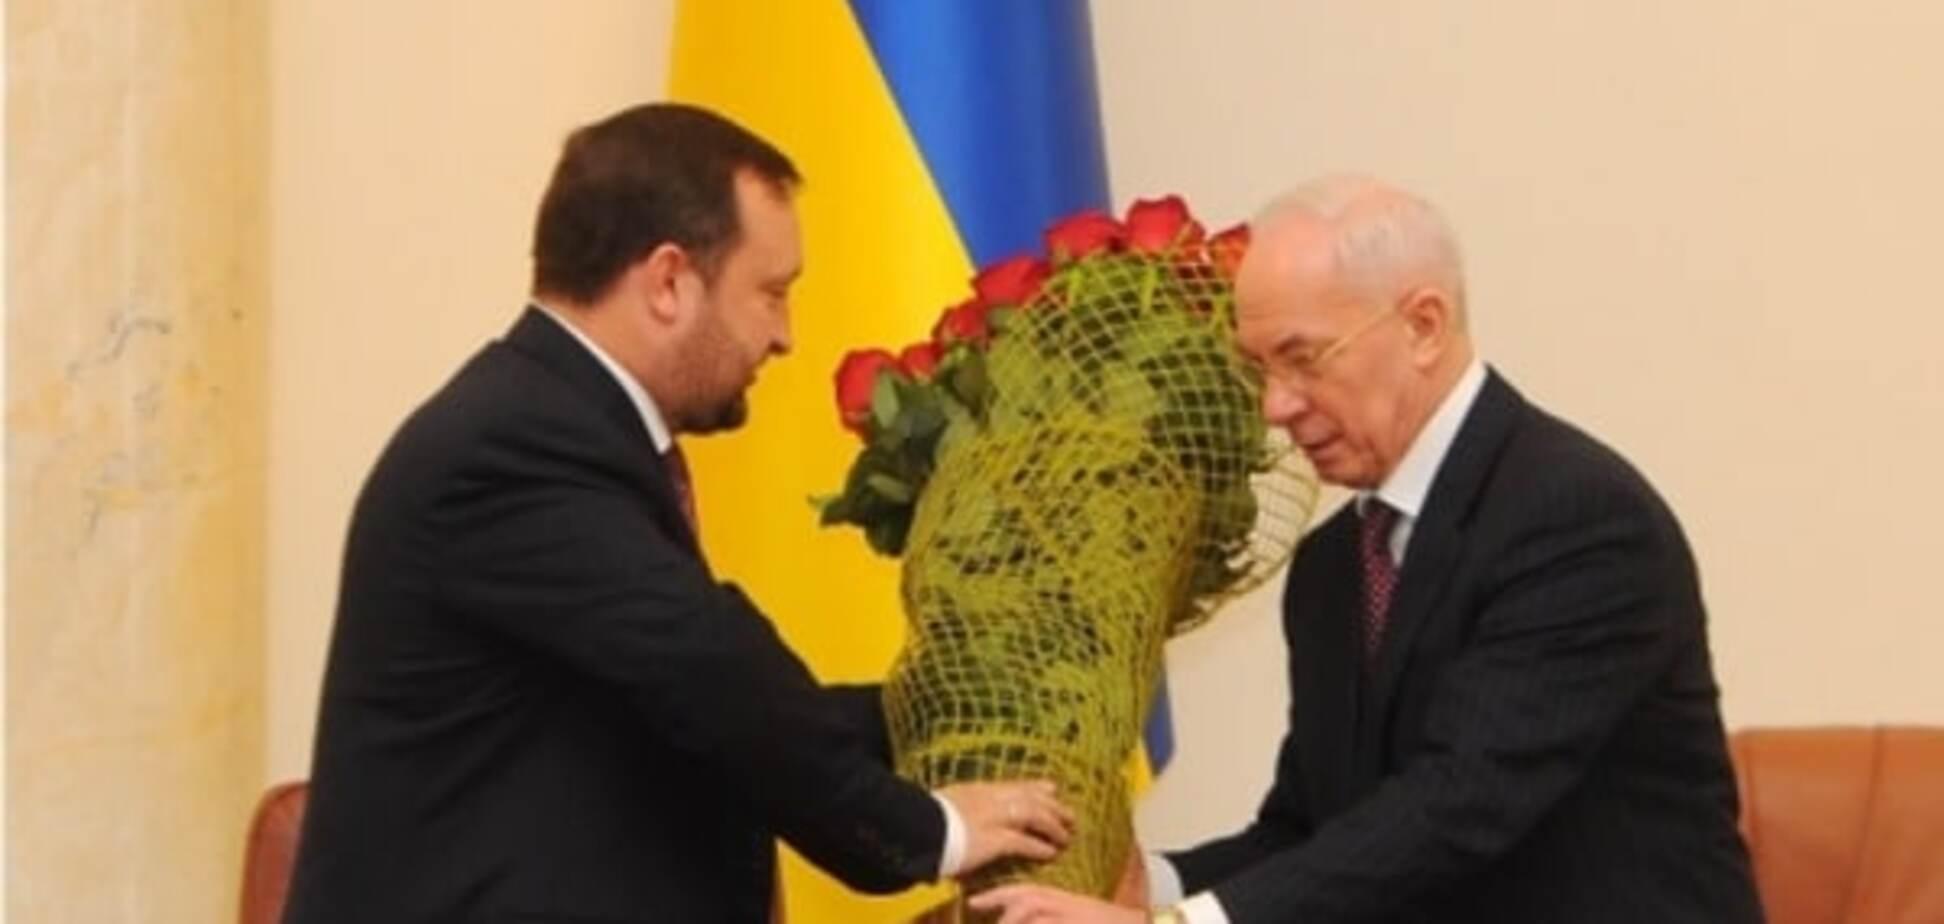 ГПУ уверяет, что санкции с Азарова, Клюева и Ко не снимали